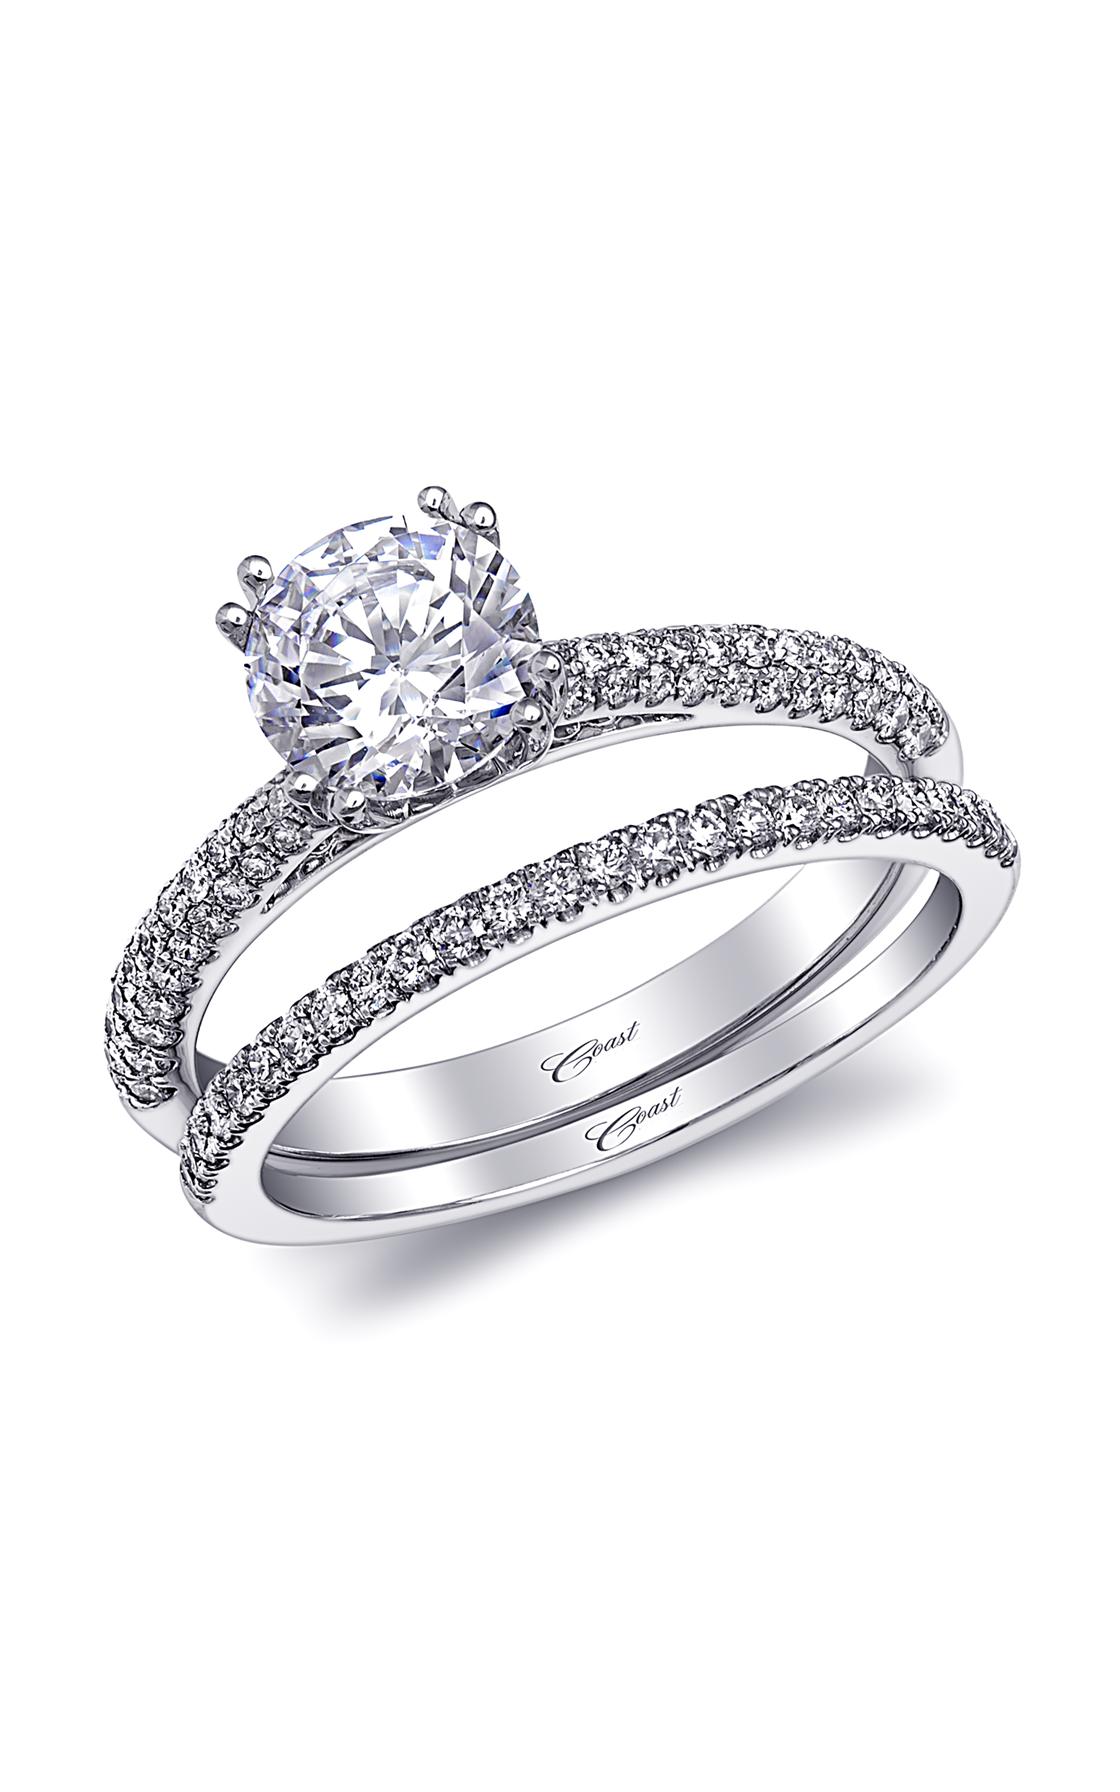 Coast Diamond Romance LC10248 product image